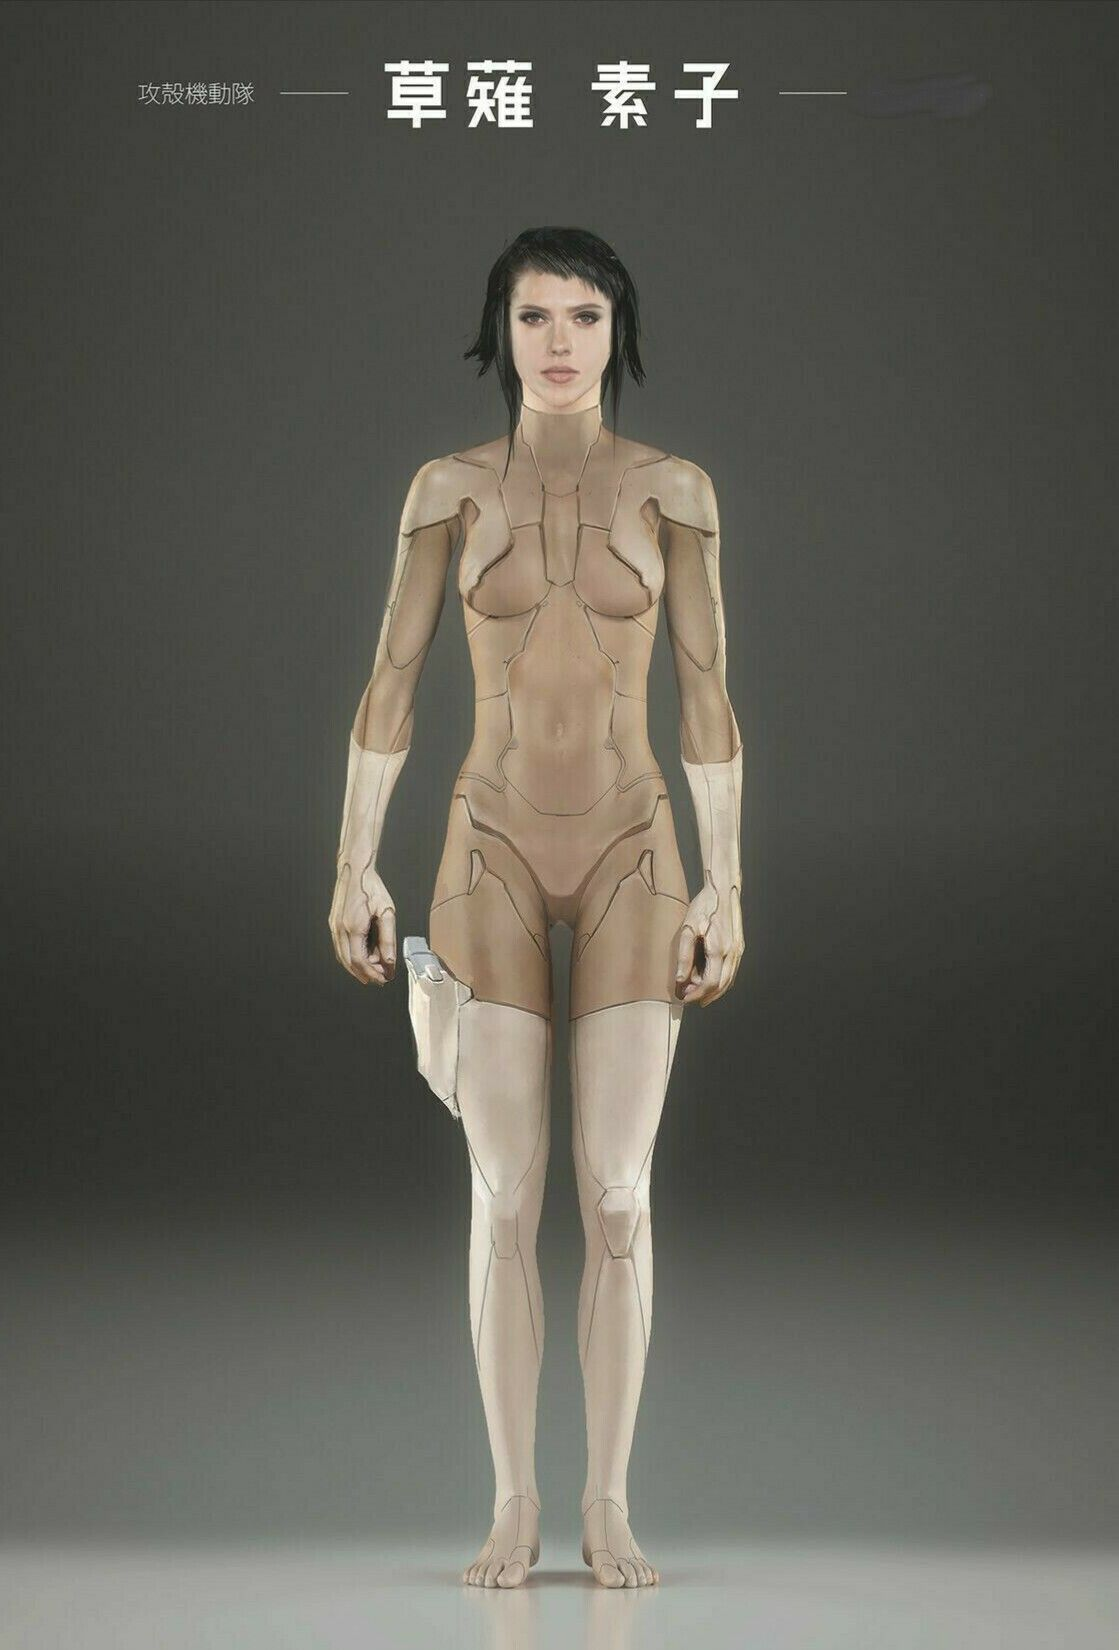 Ghost In The Shell 2017 Synthetic Full Body Prosthesis Human Motoko Kusanagi Figure 攻殻機動隊 2017 少佐 草薙素子 フ Ghost In The Shell Cyberpunk Character Female Cyborg